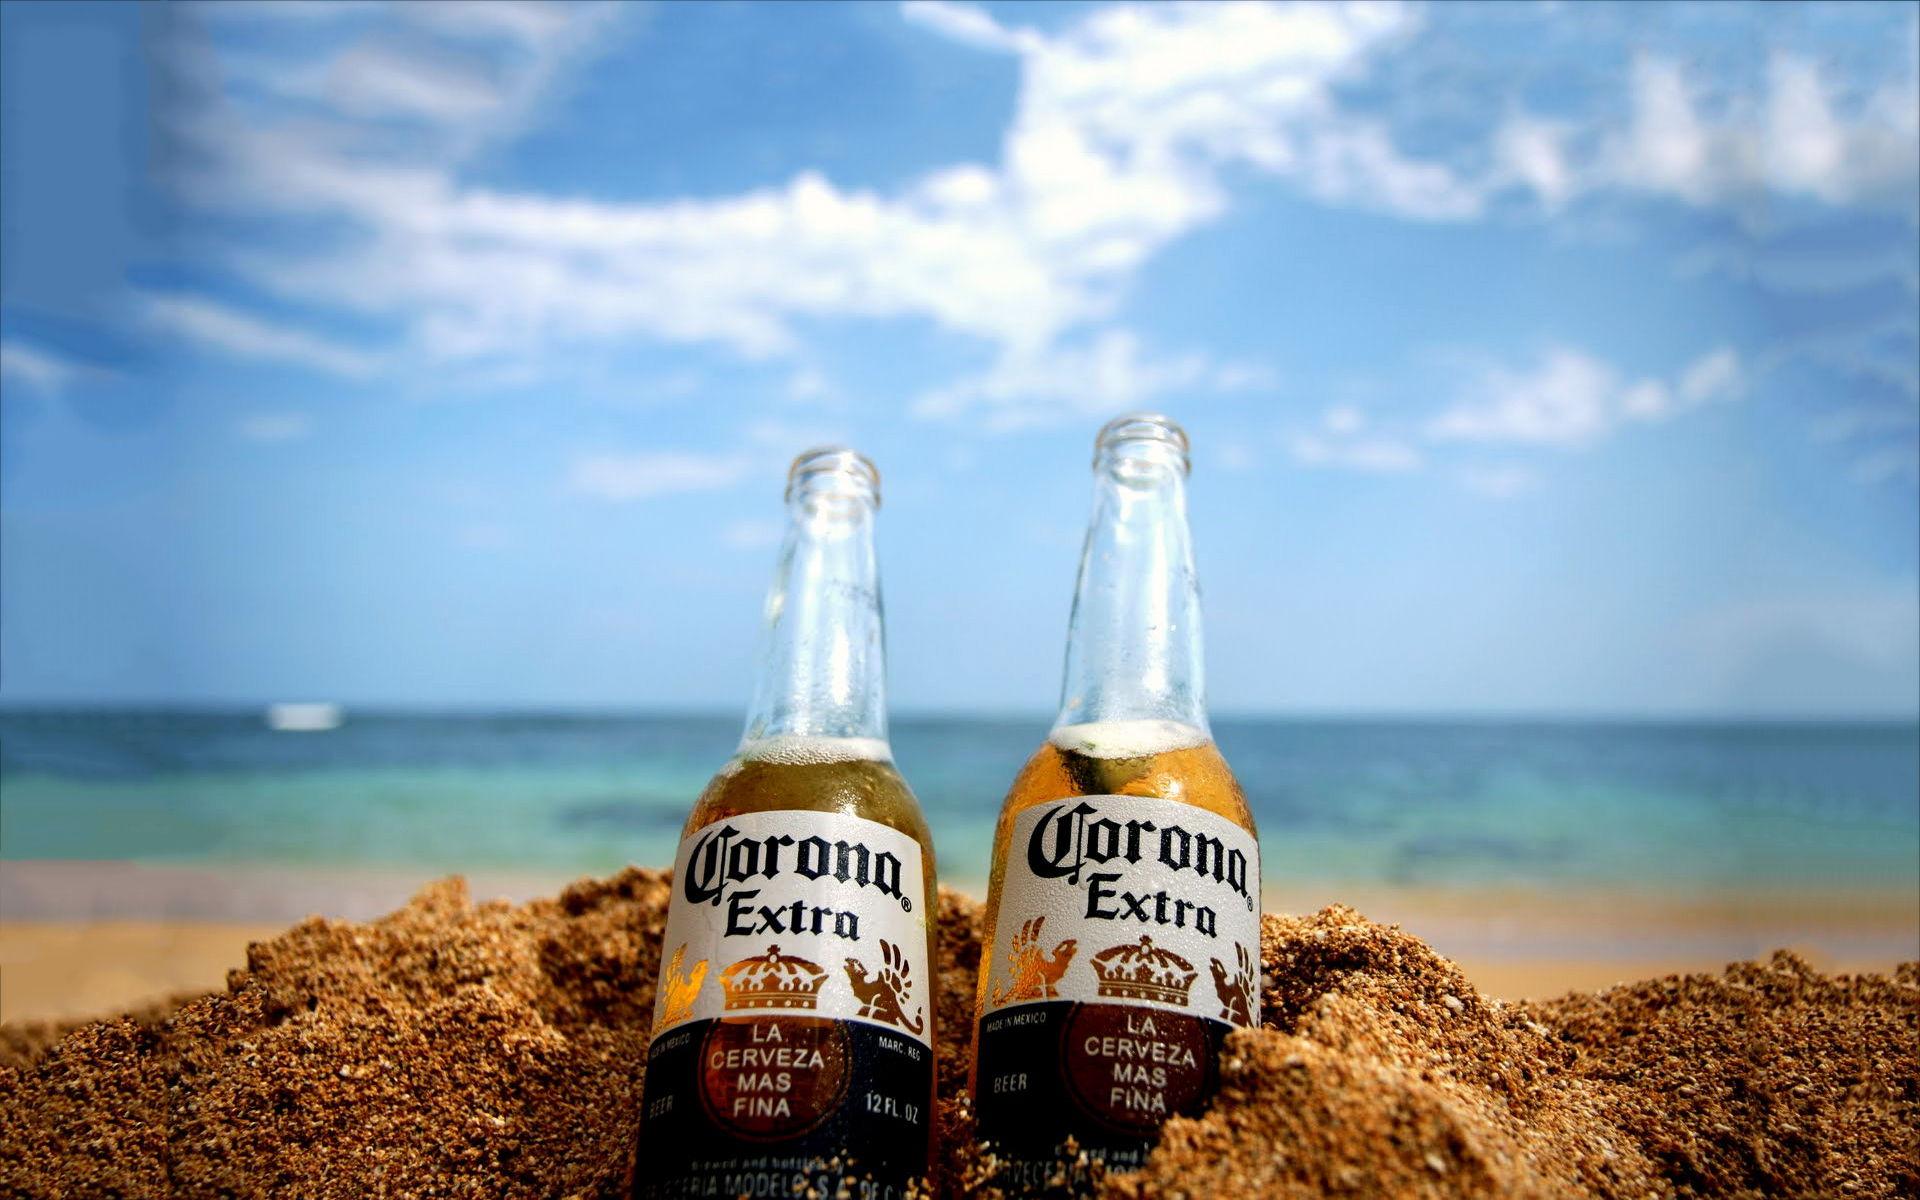 пиво Corona Extra, пиво Корона Экстра, пиво Корона Экстра цена, Производитель, пиво Корона Экстра отзывы